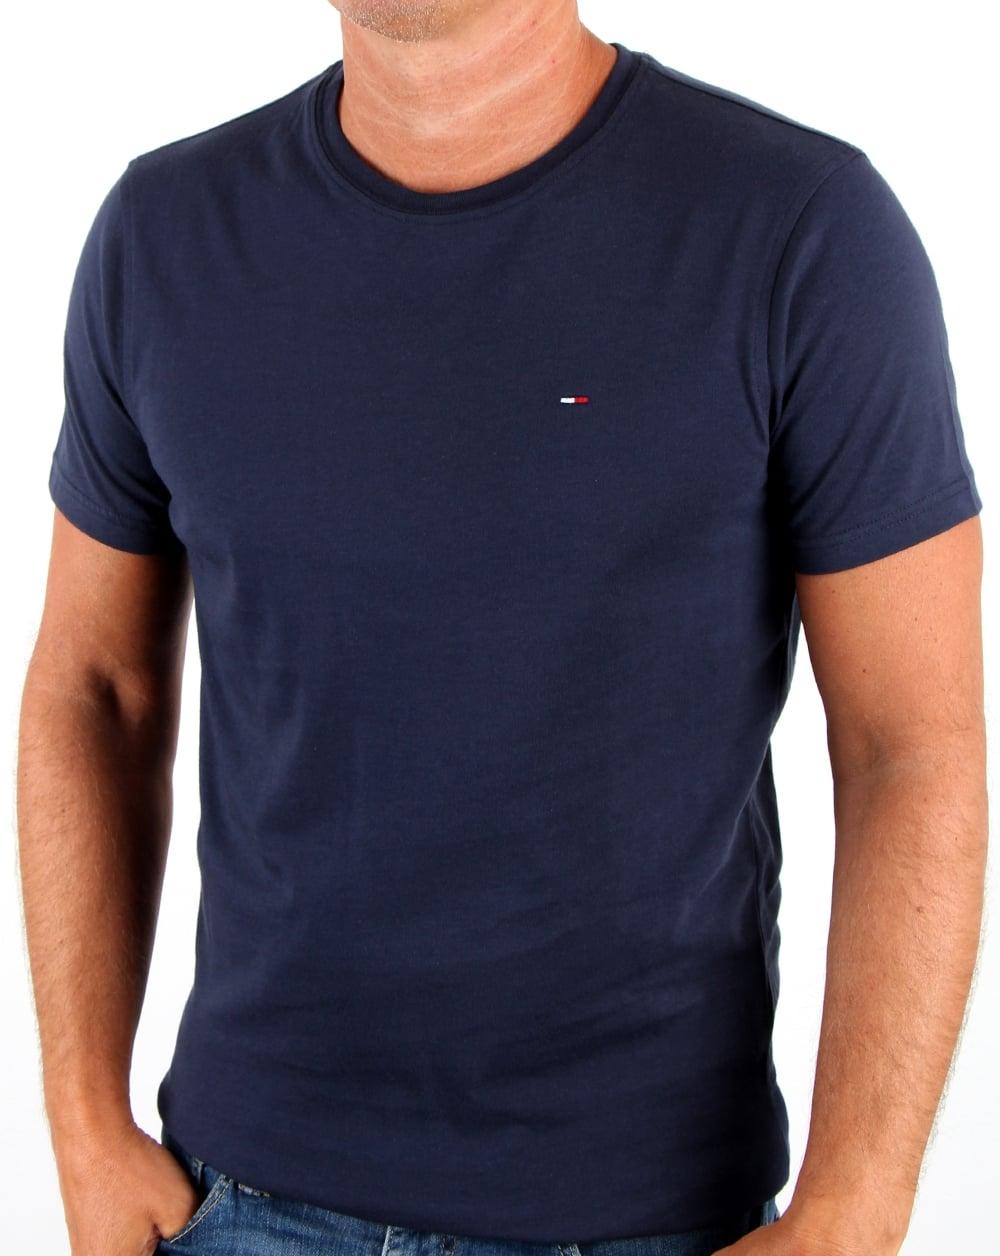 da06c3ce1 T-shirt koszulka męska Tommy Hilfiger Navy r.L - 7363771928 ...